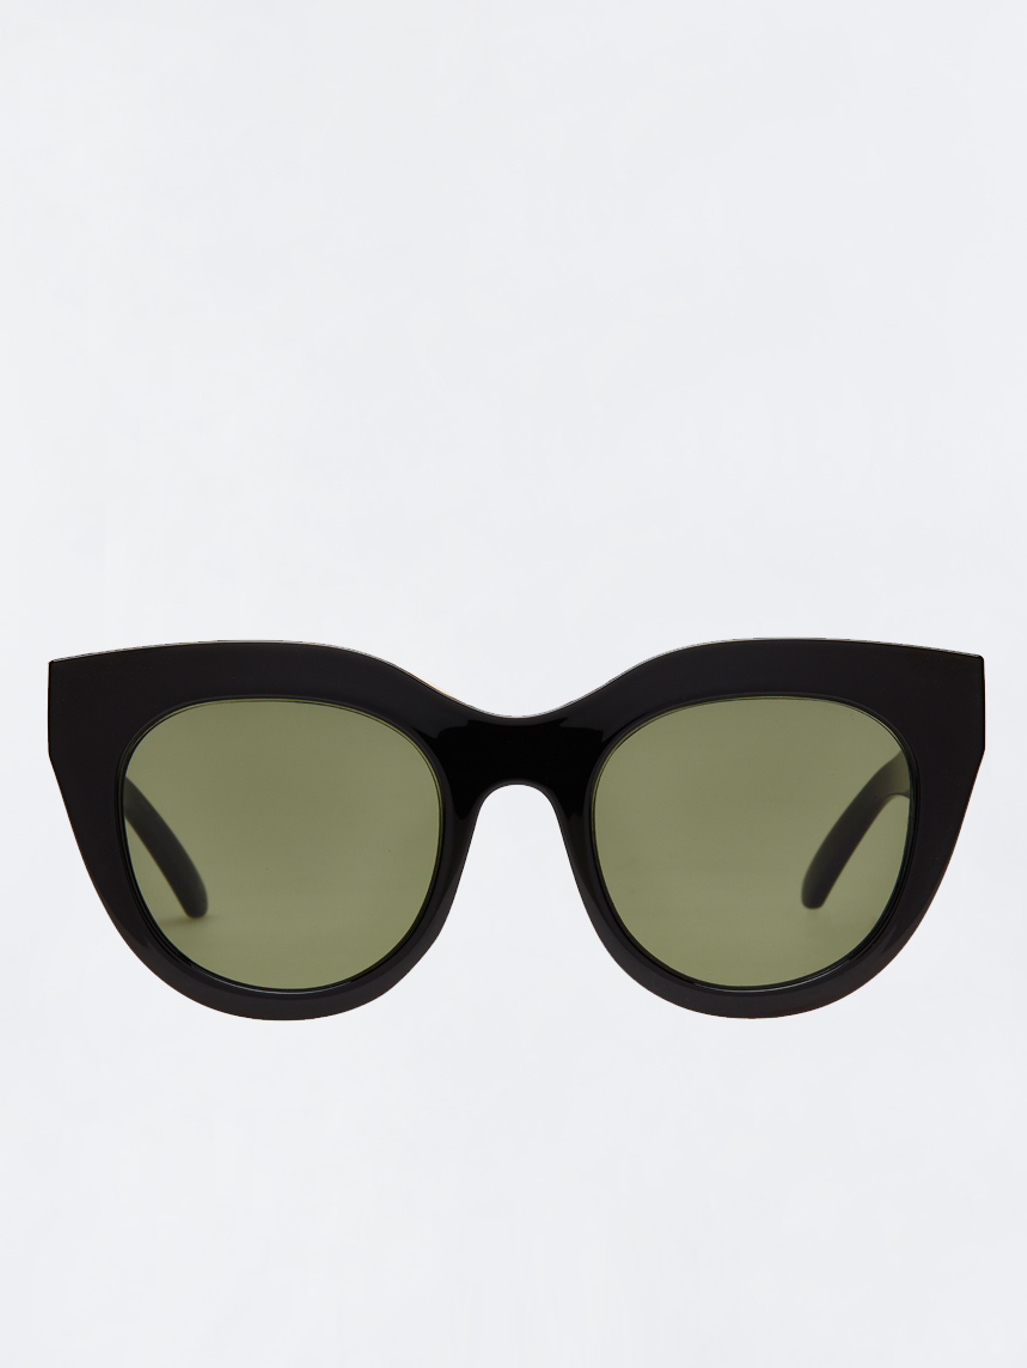 2bda8cbb2d5 Air Heart Black Gold W  Khaki Mono Lens - Le Specs